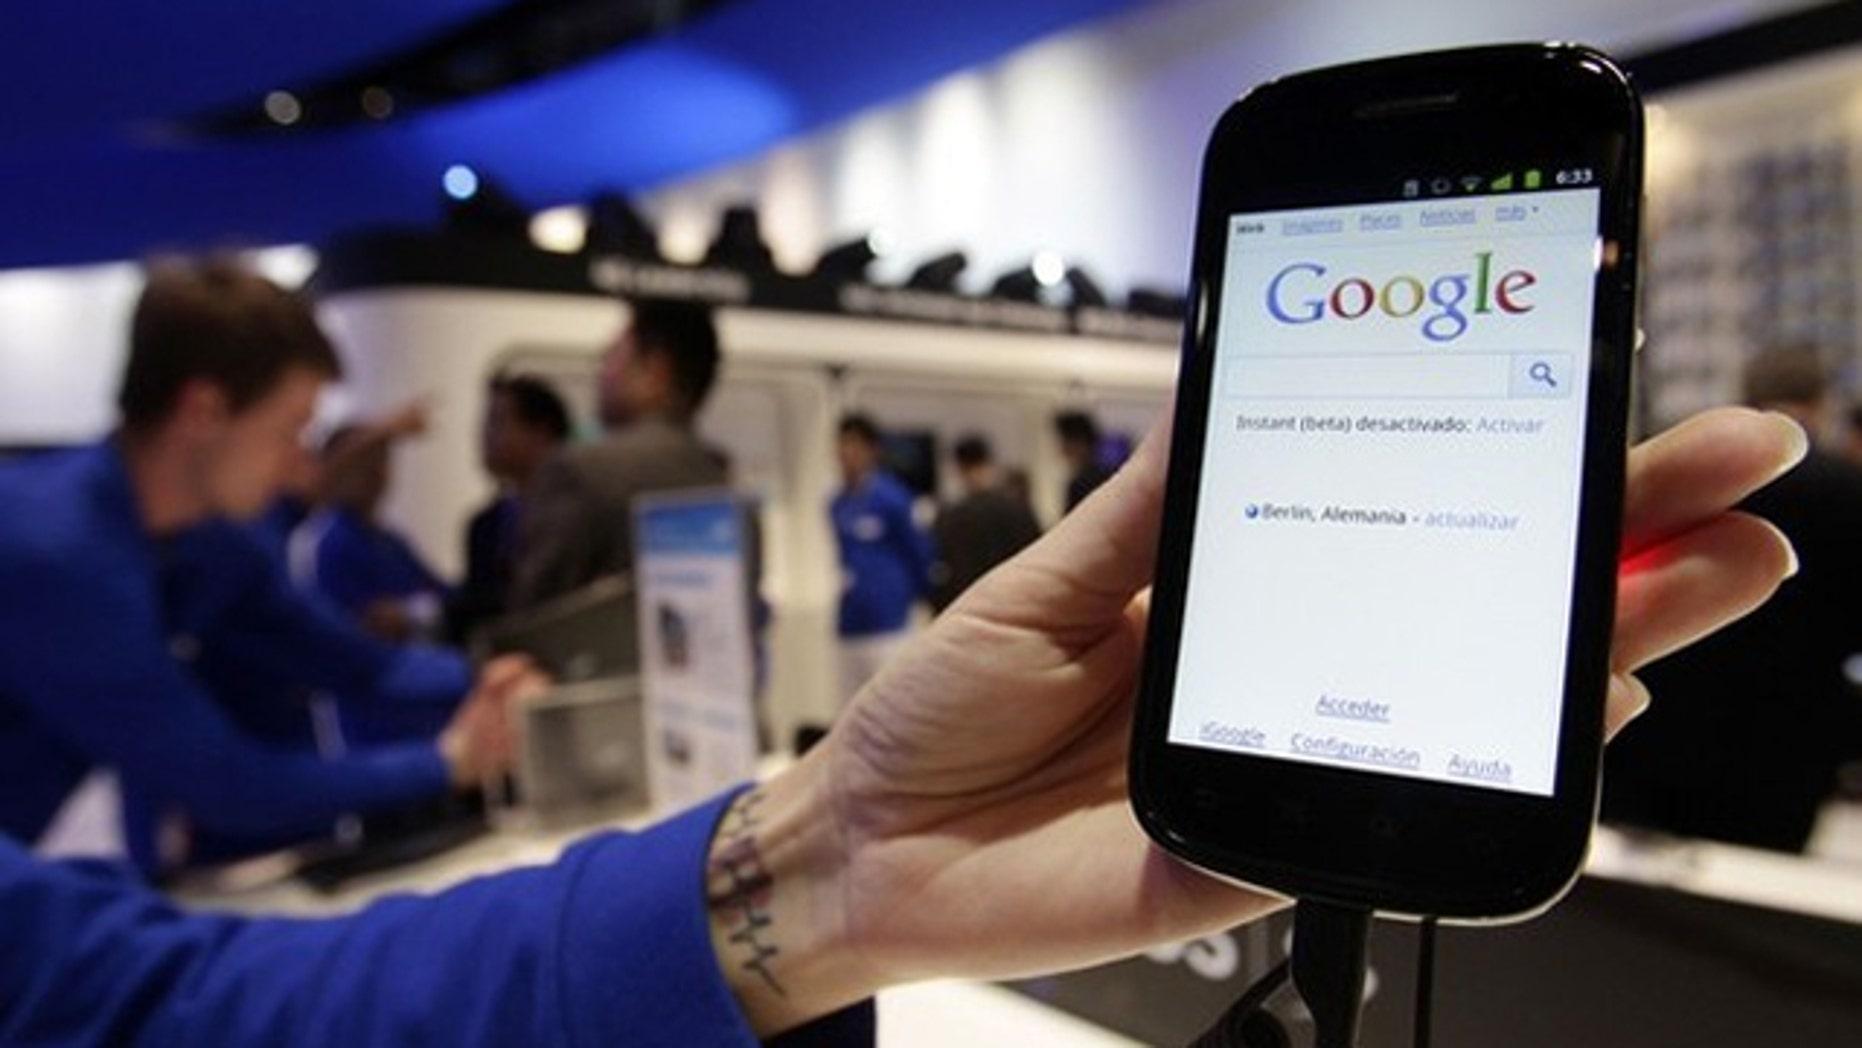 Microsoft's big moneymaker: Google phones